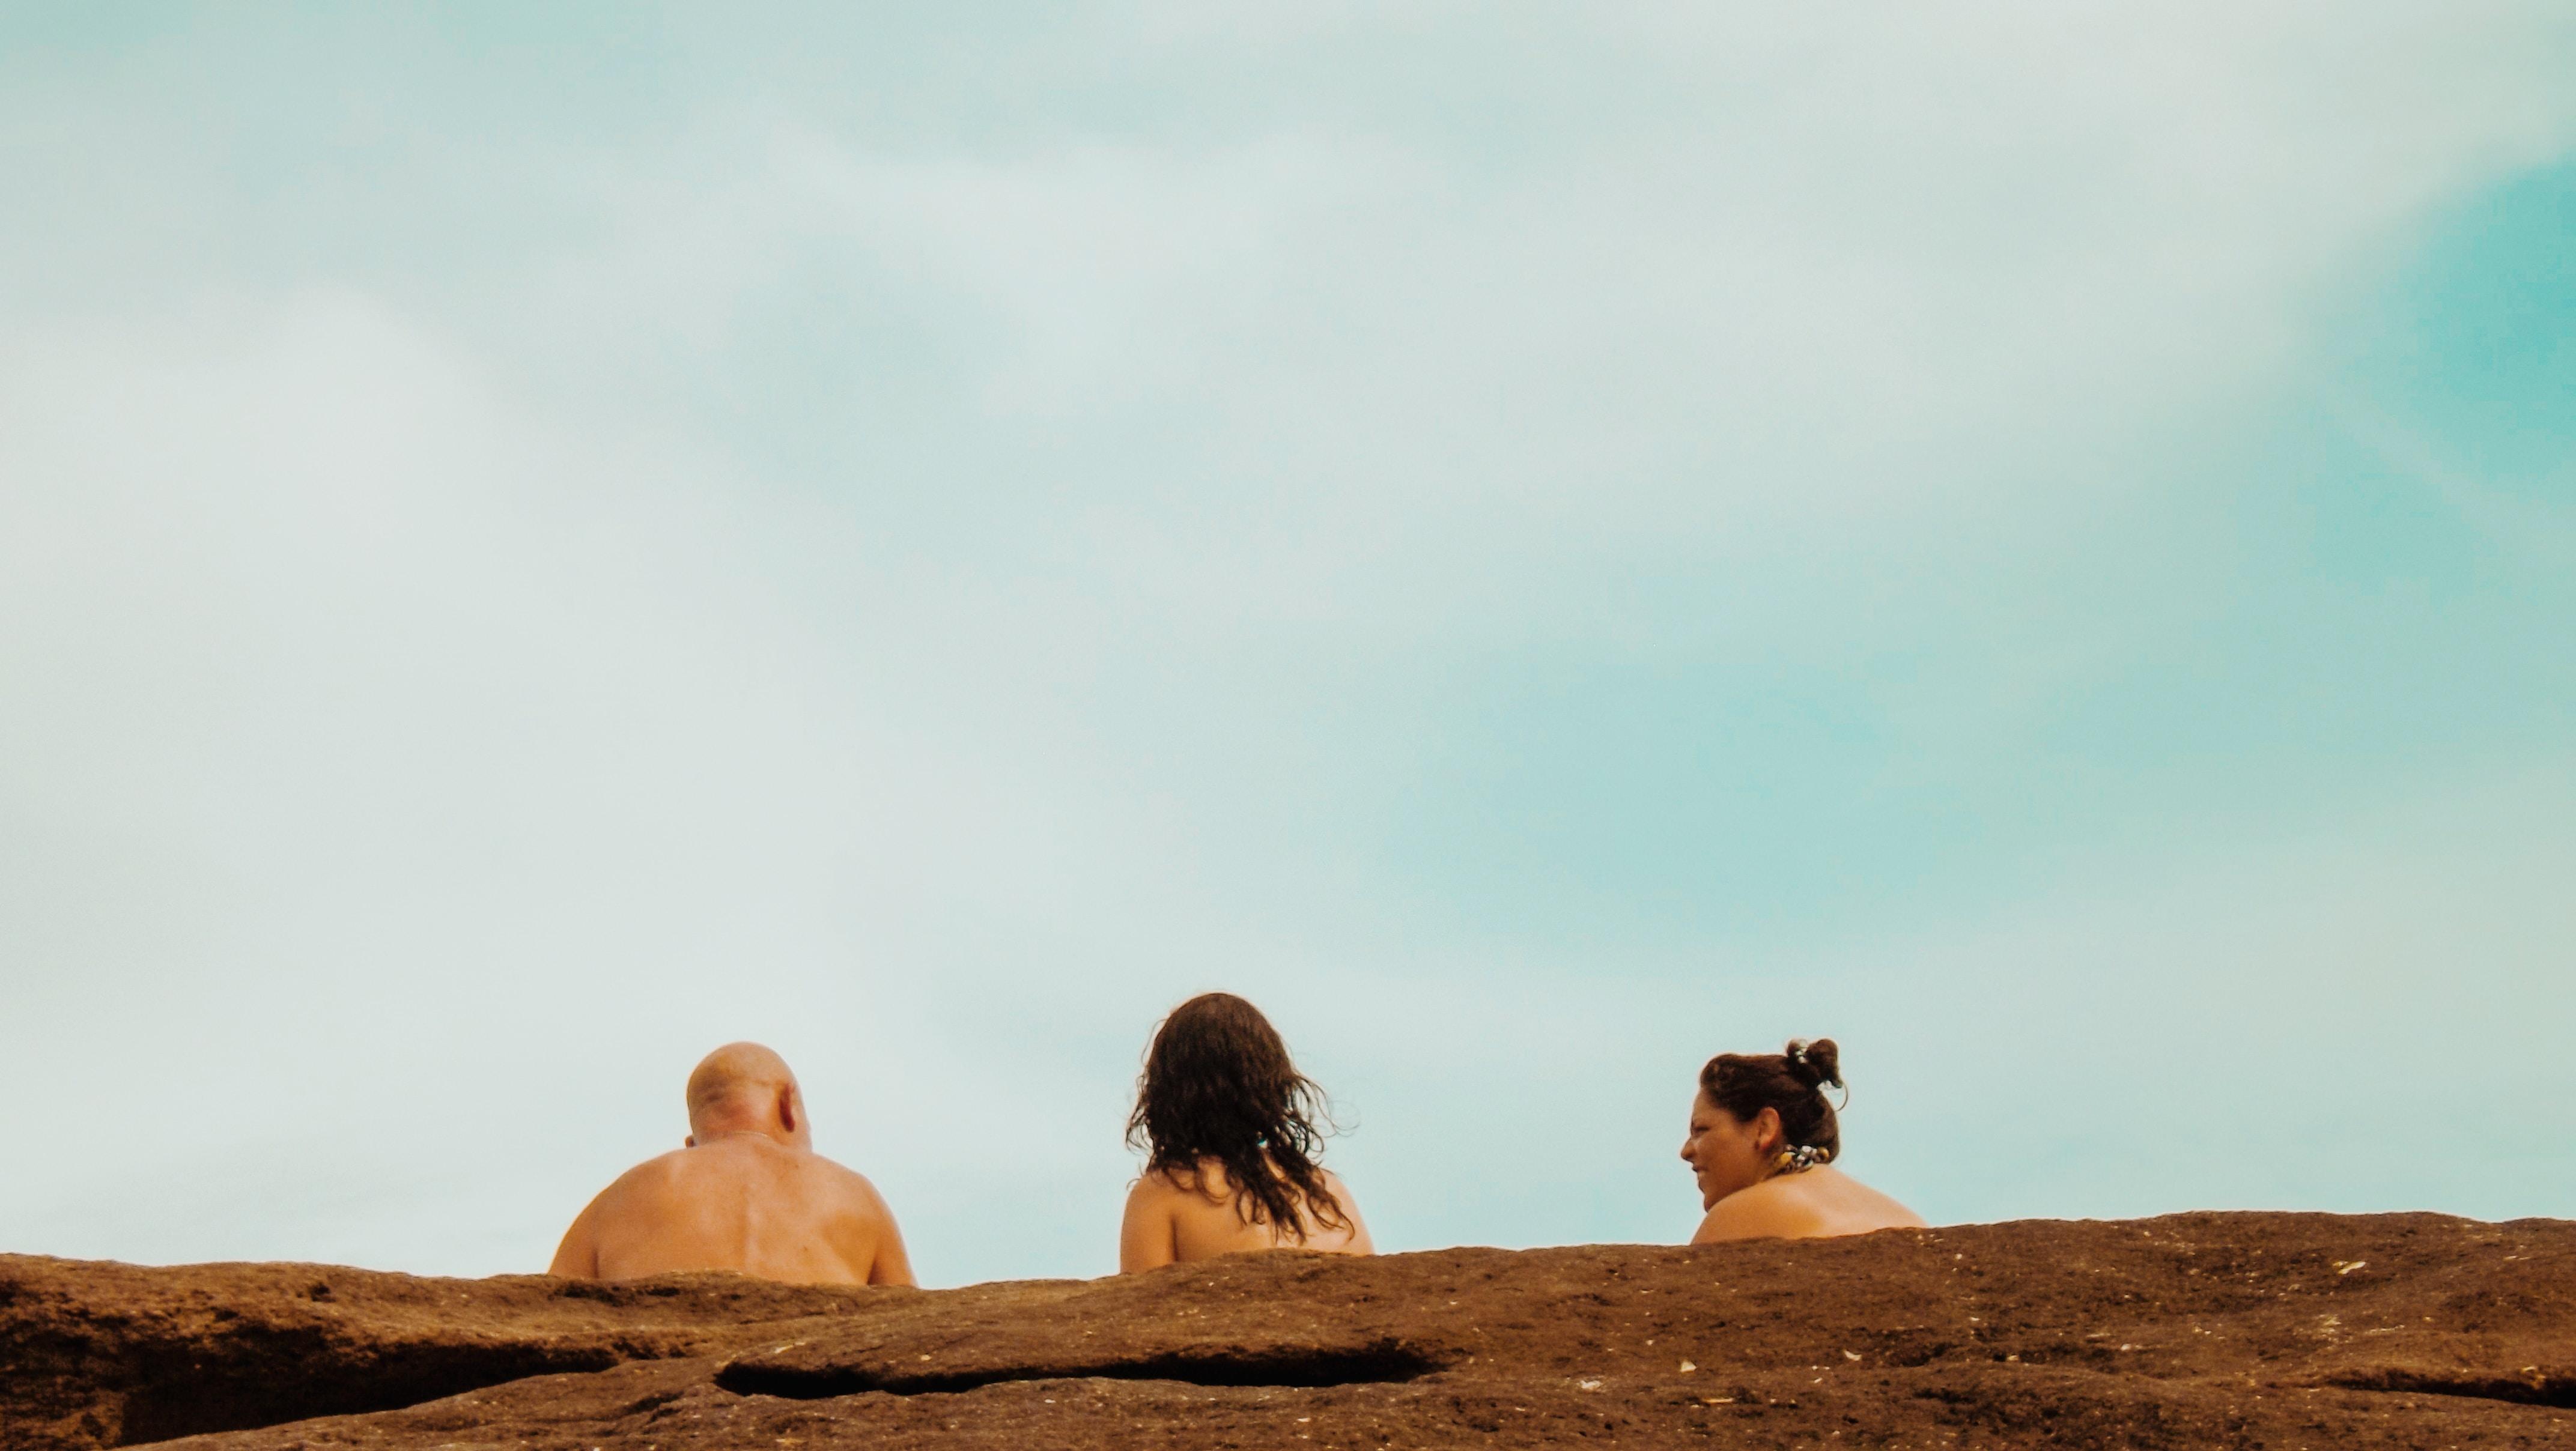 three people standing on brown soil